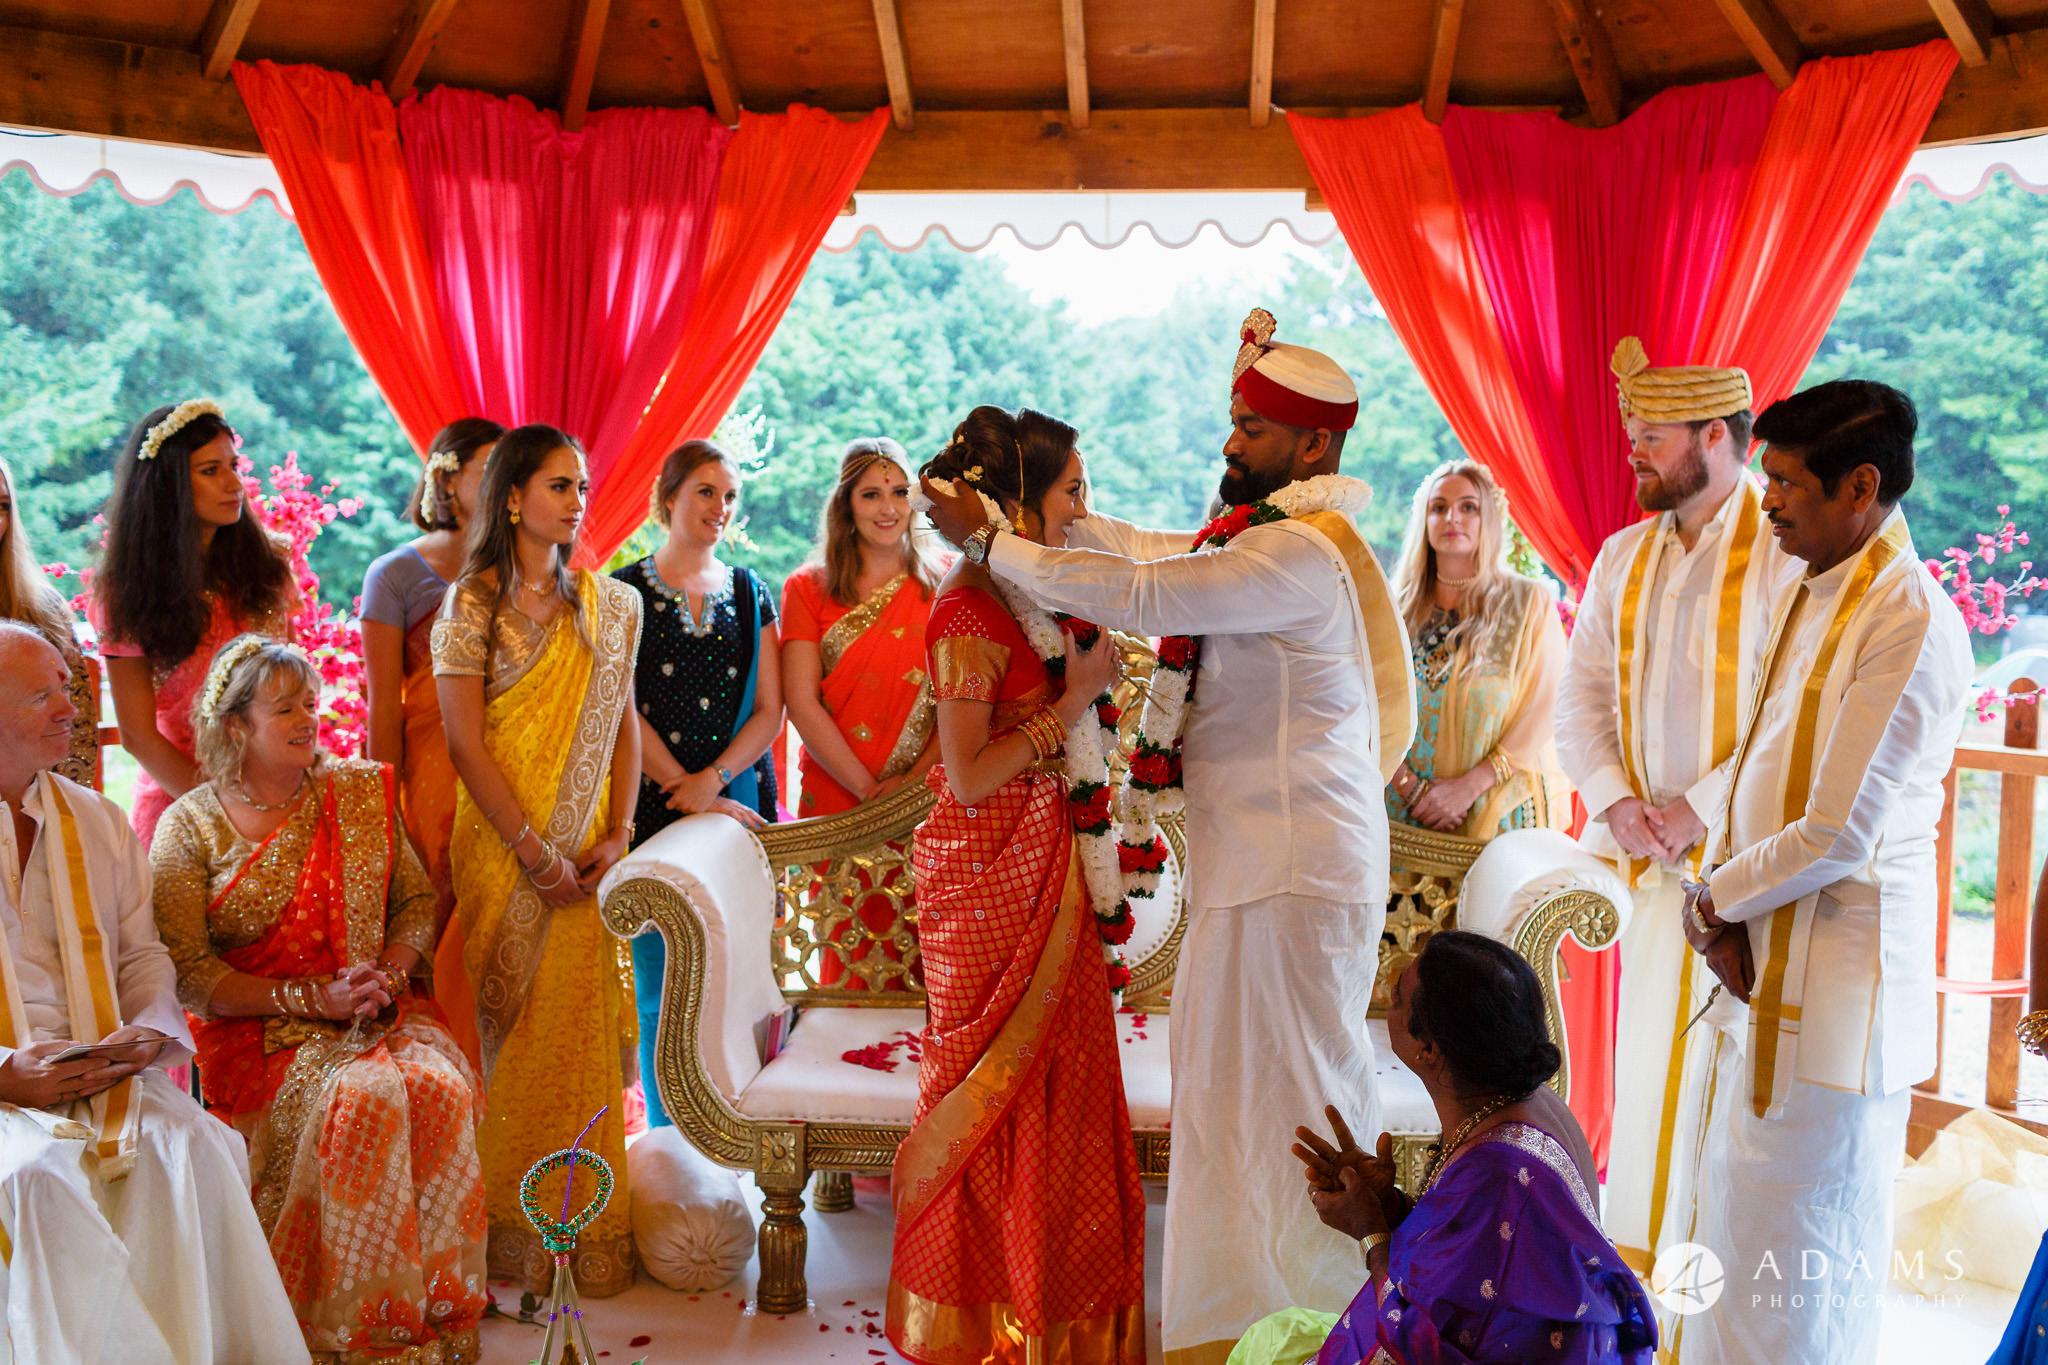 walled garden orchardleigh wedding groom and bride exchange the garlands